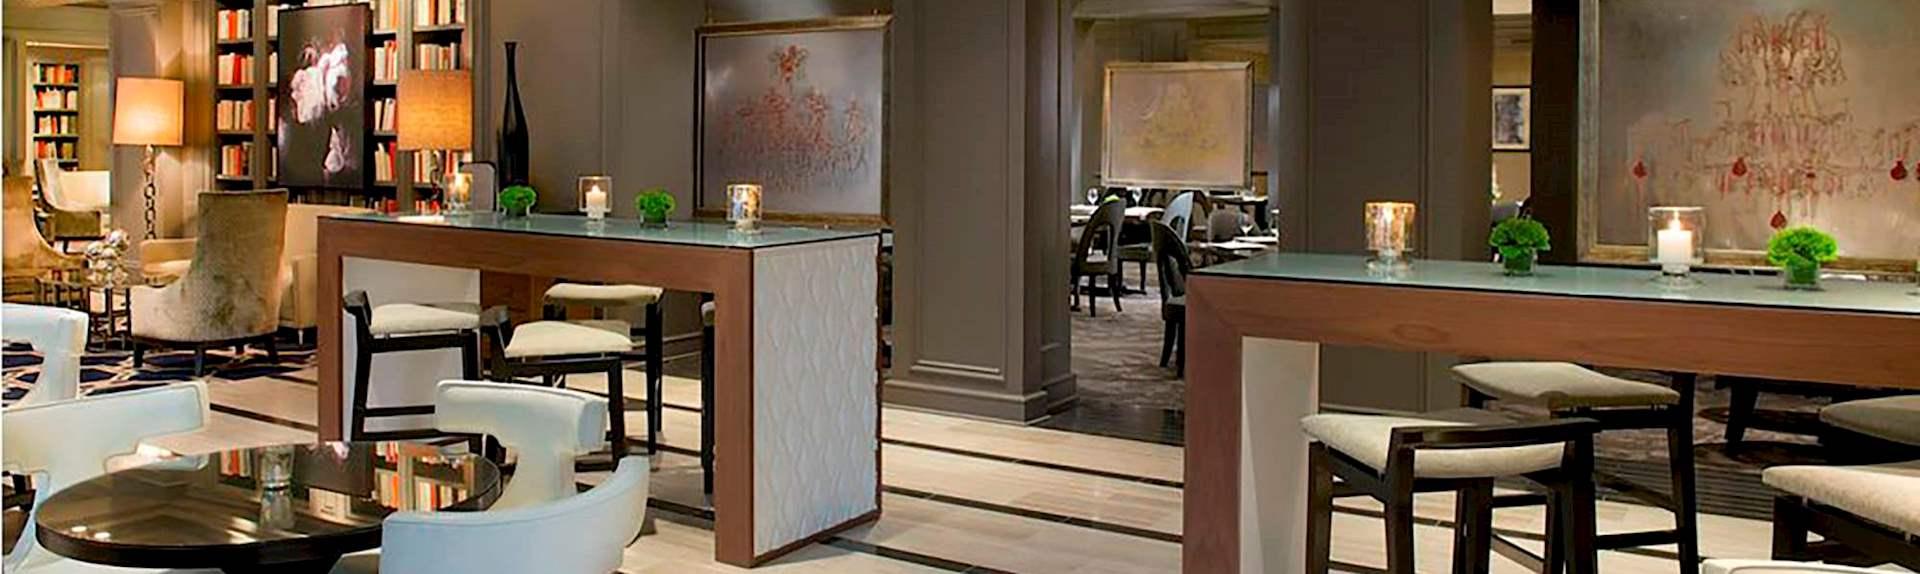 Indulge Dining Experiences top of Melrose Georgetown, Washington